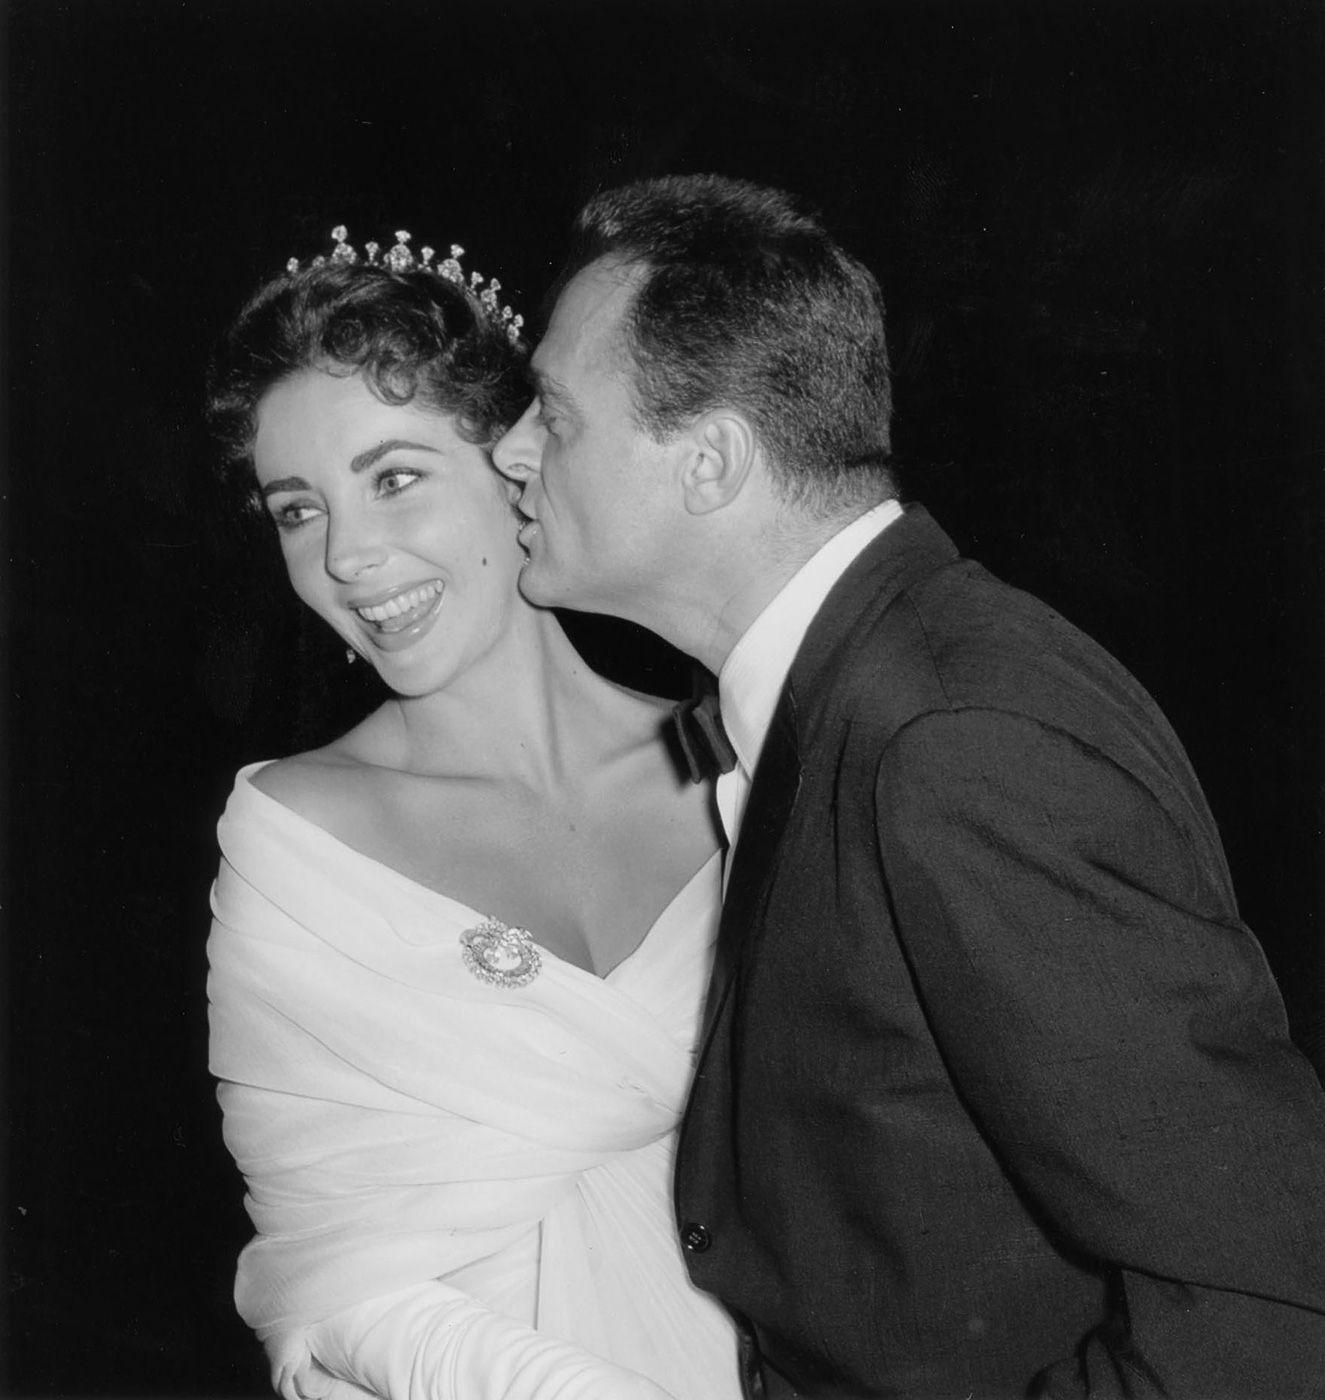 9. Mike Todd & Elizabeth Taylor